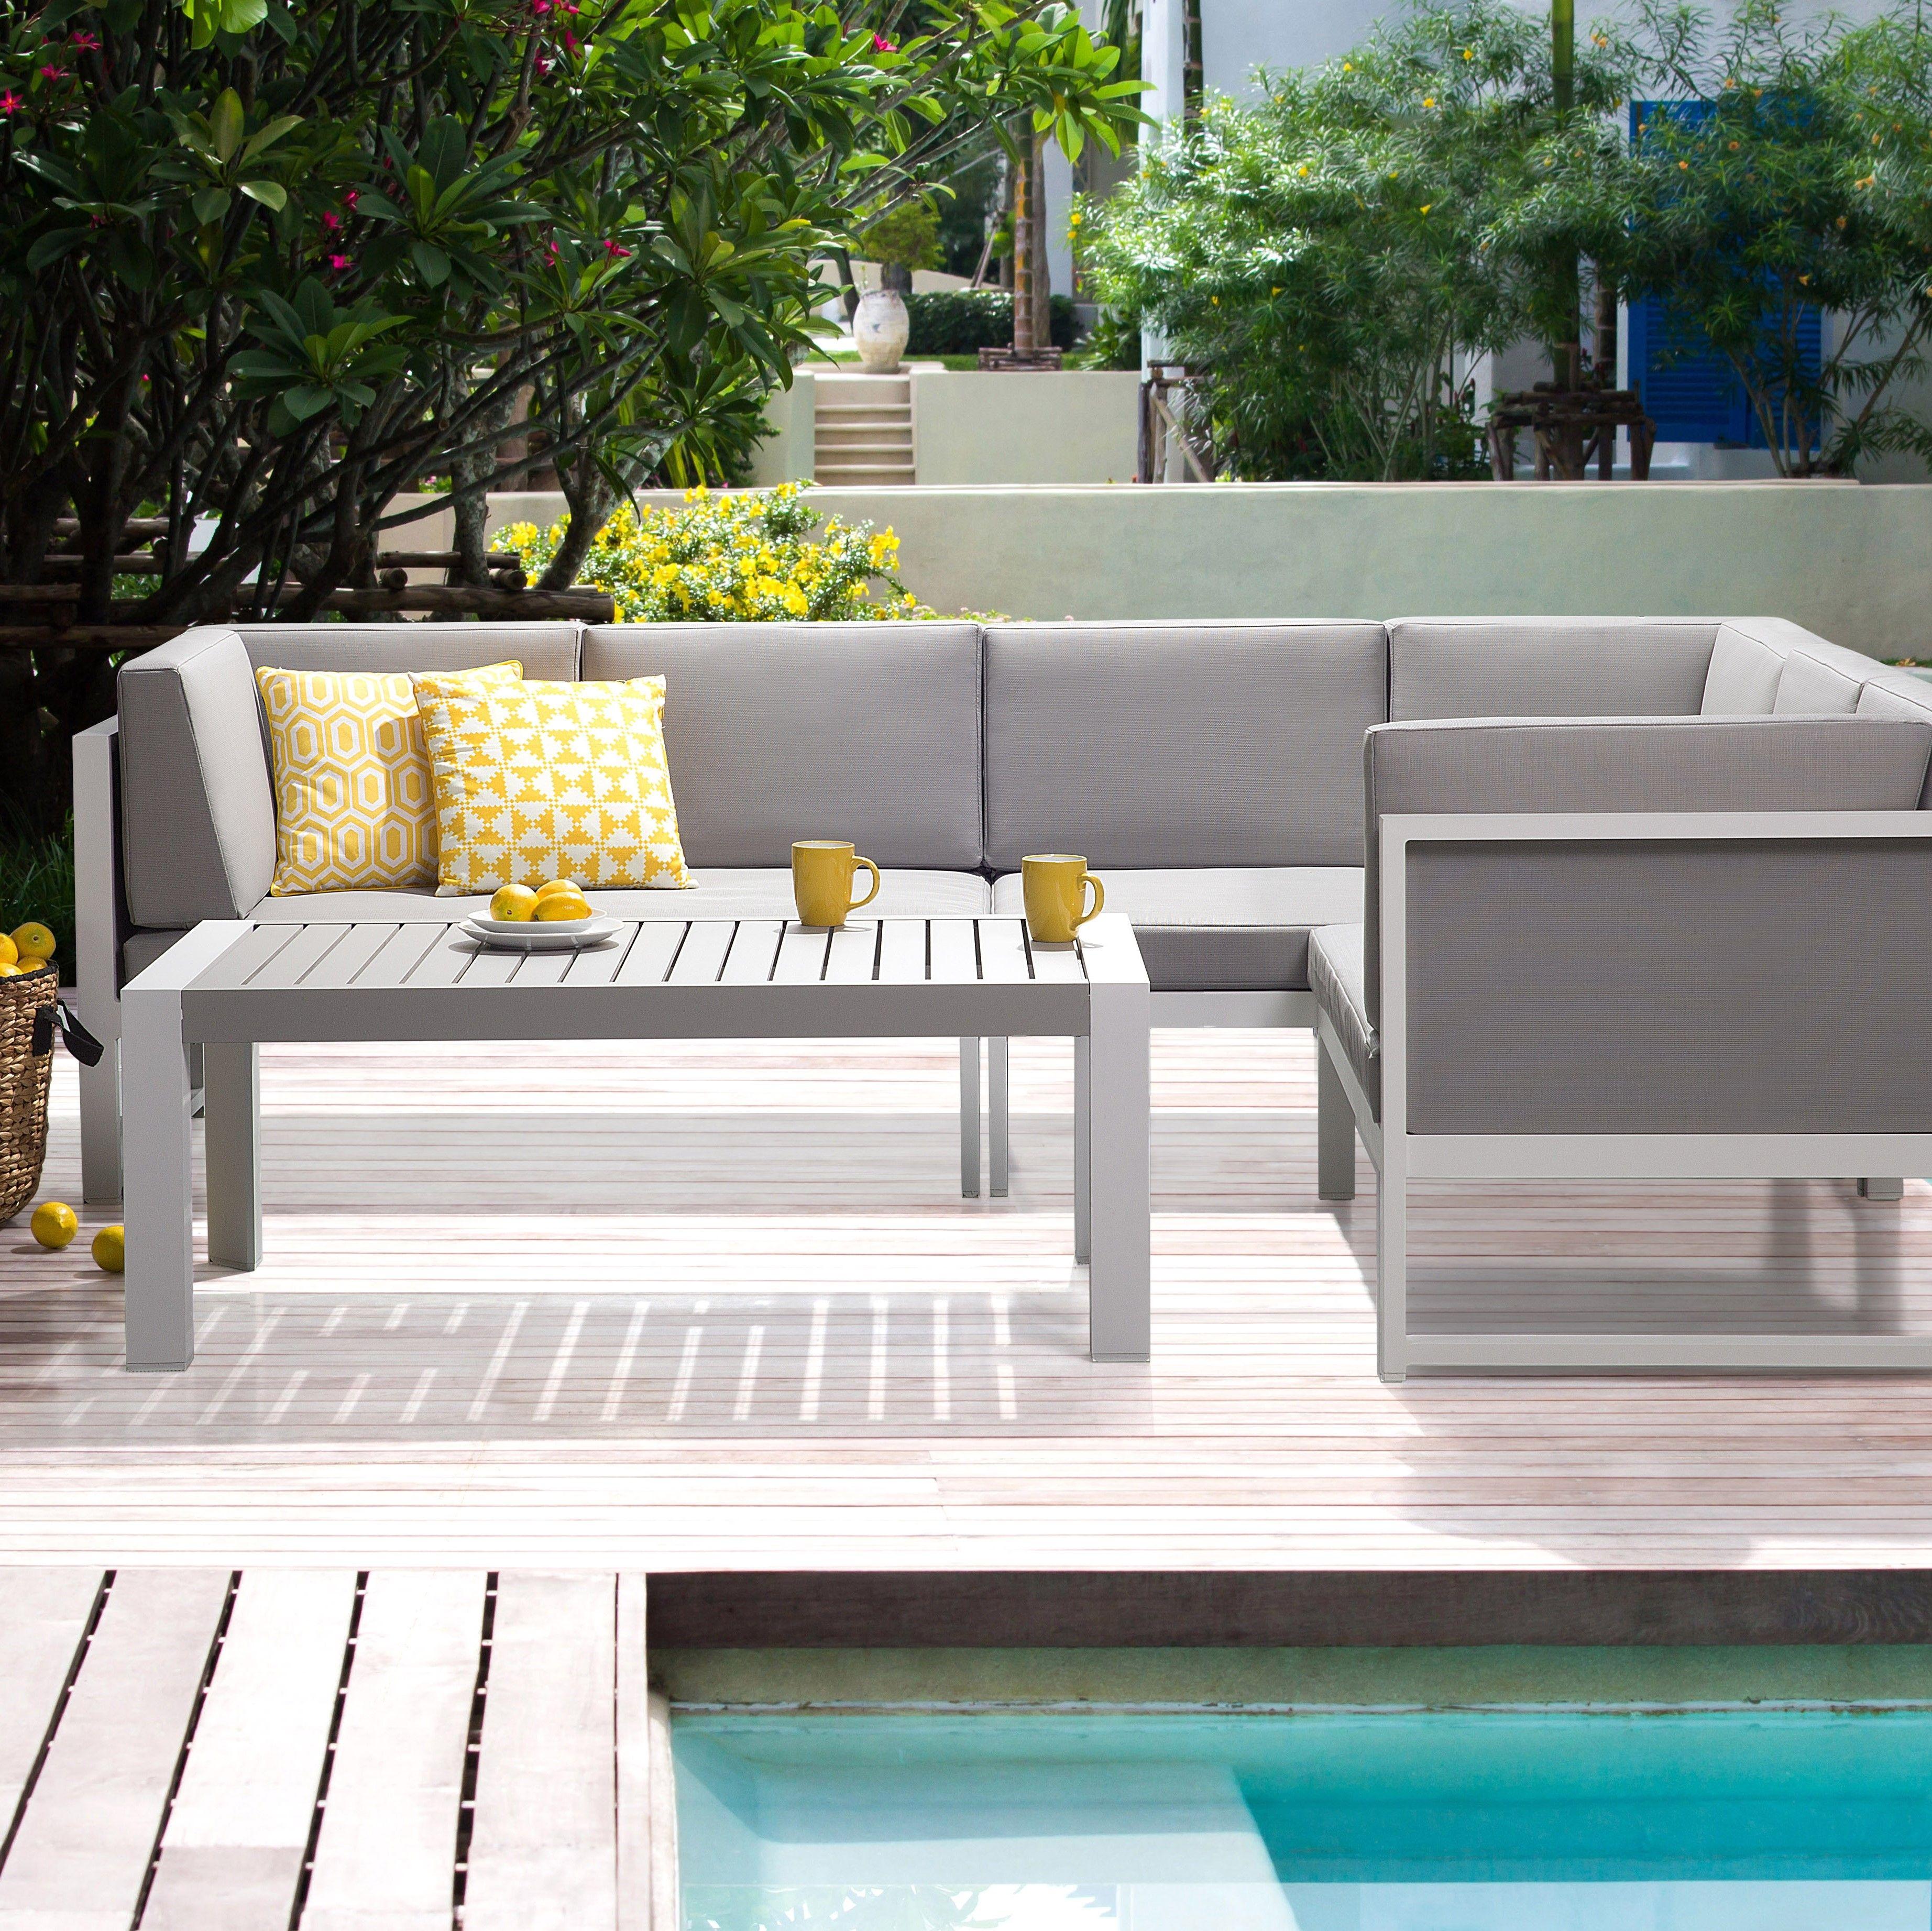 Backes 6 Seater Sofa Set Outdoor Sofa Sets Outdoor Sofa Table Corner Sofa Set